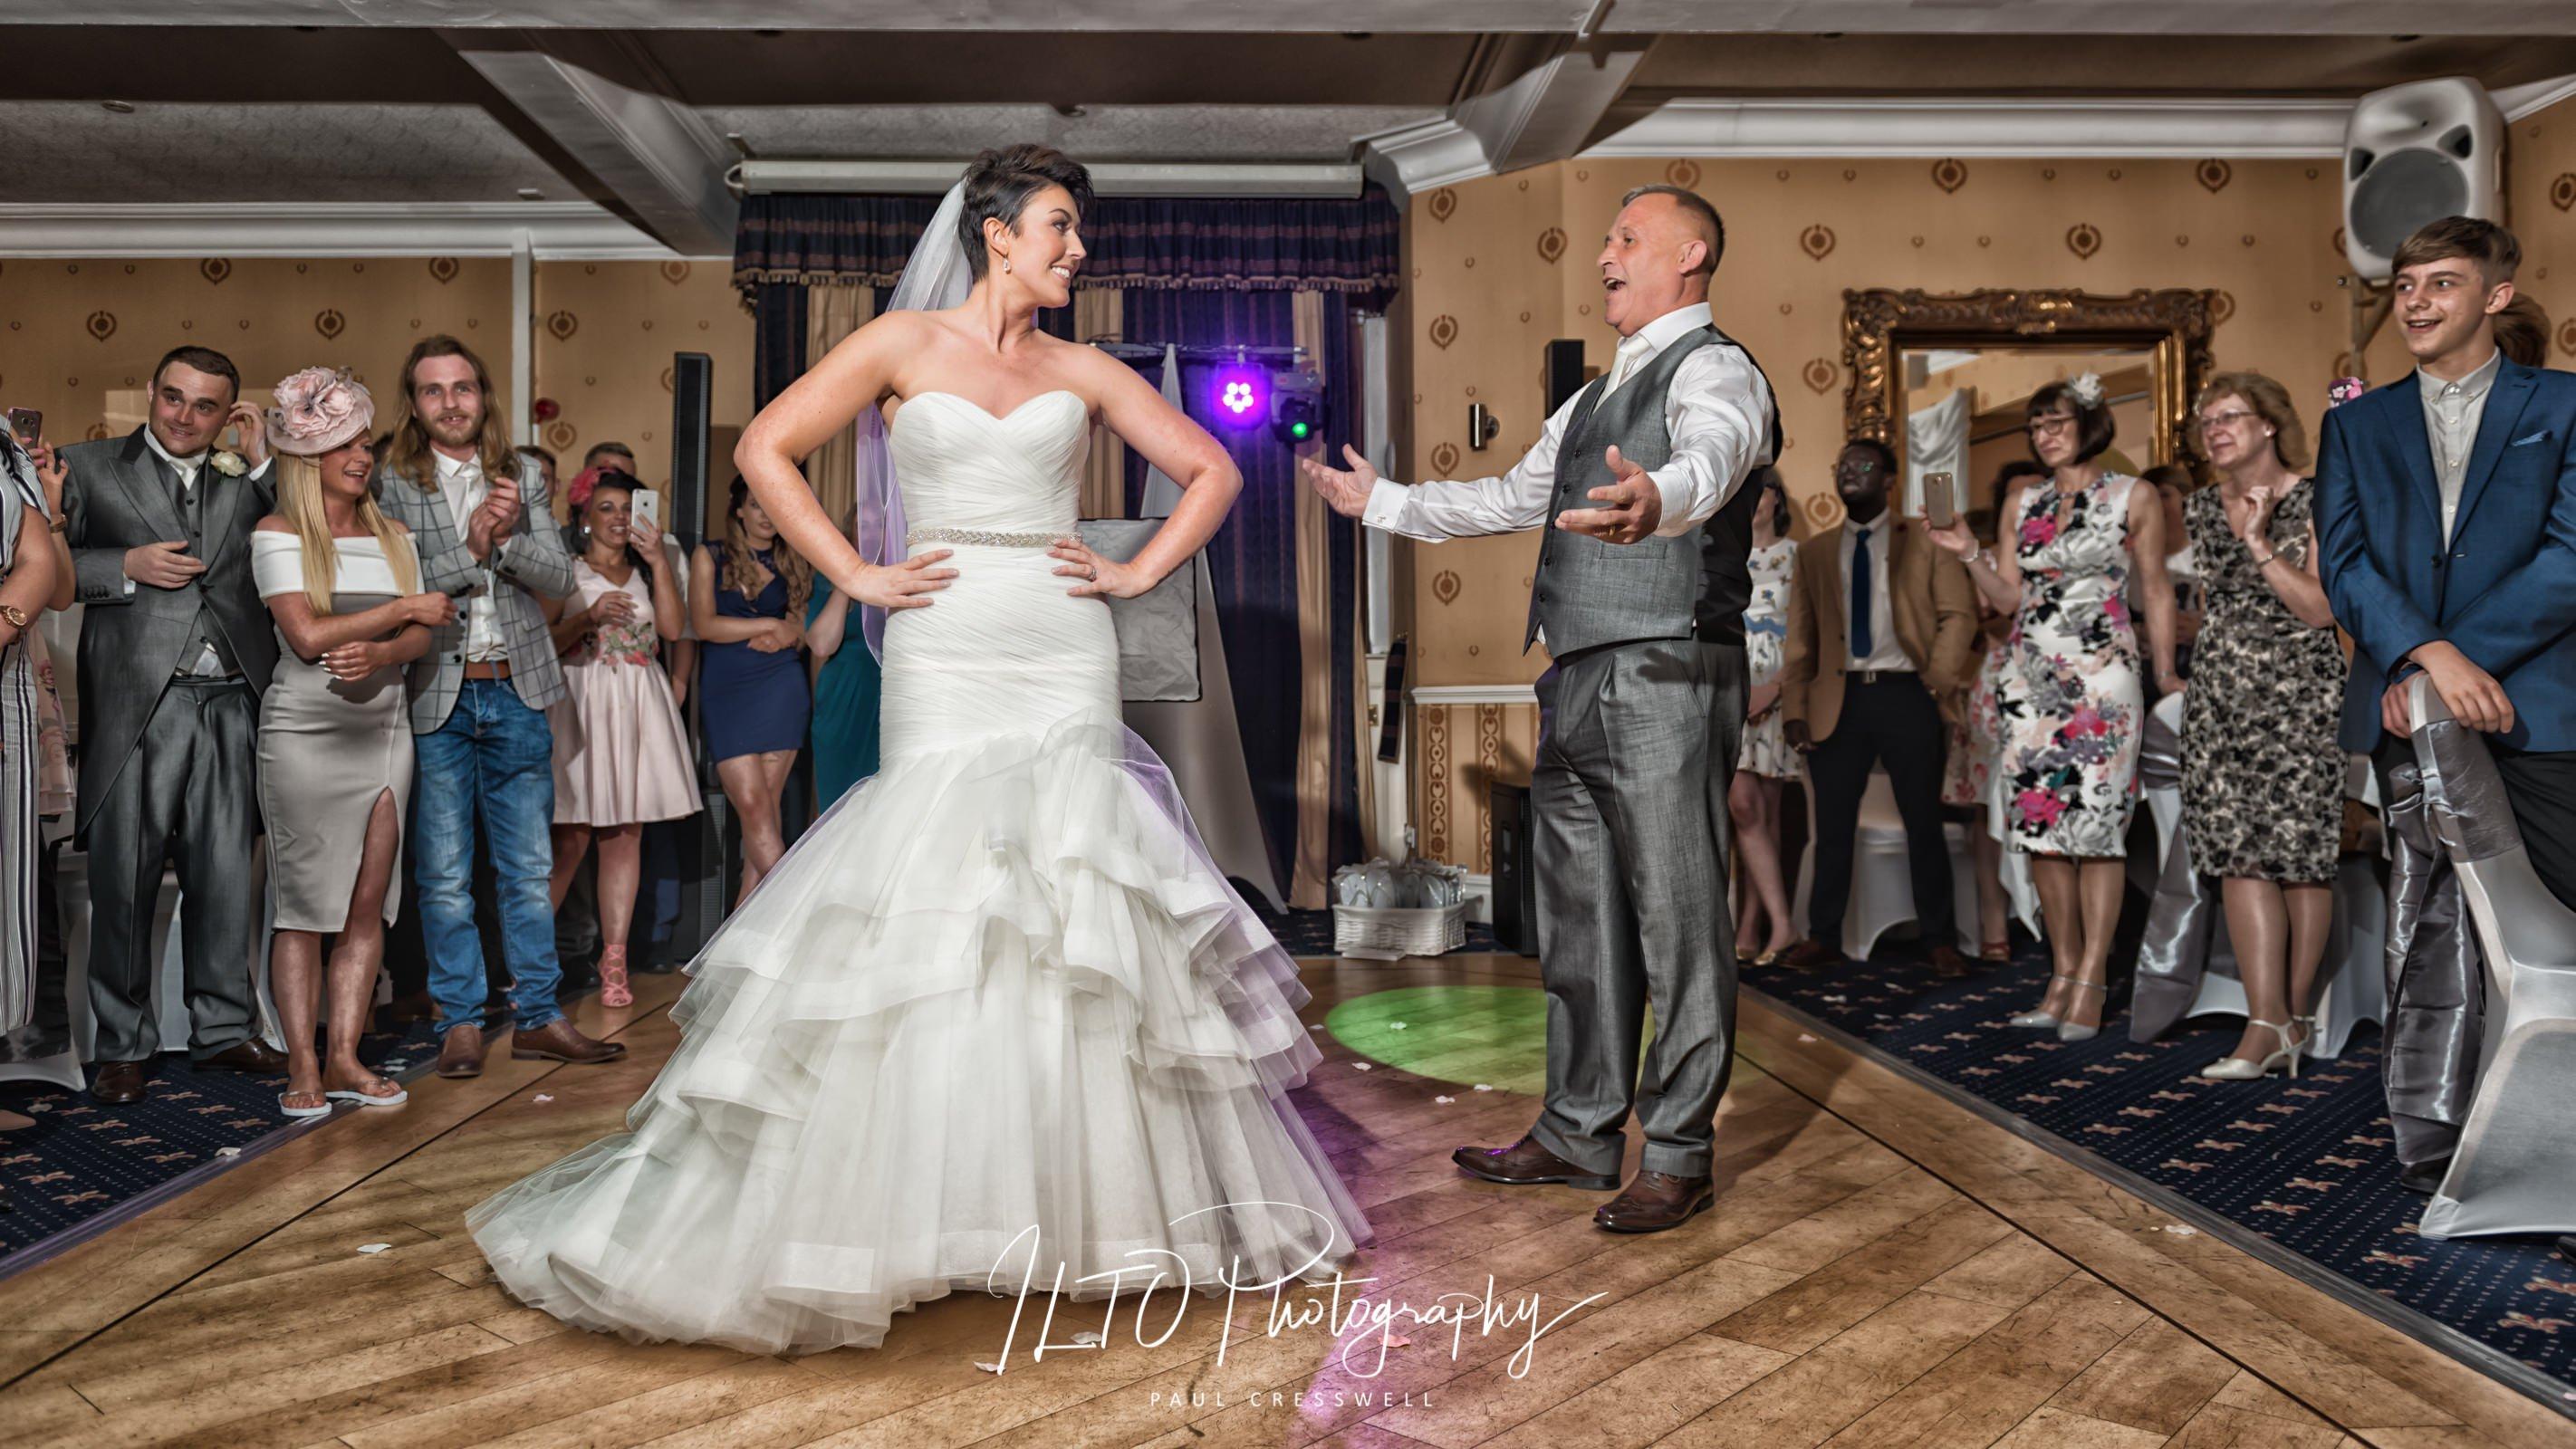 funny wedding photos Leeds wedding photographer